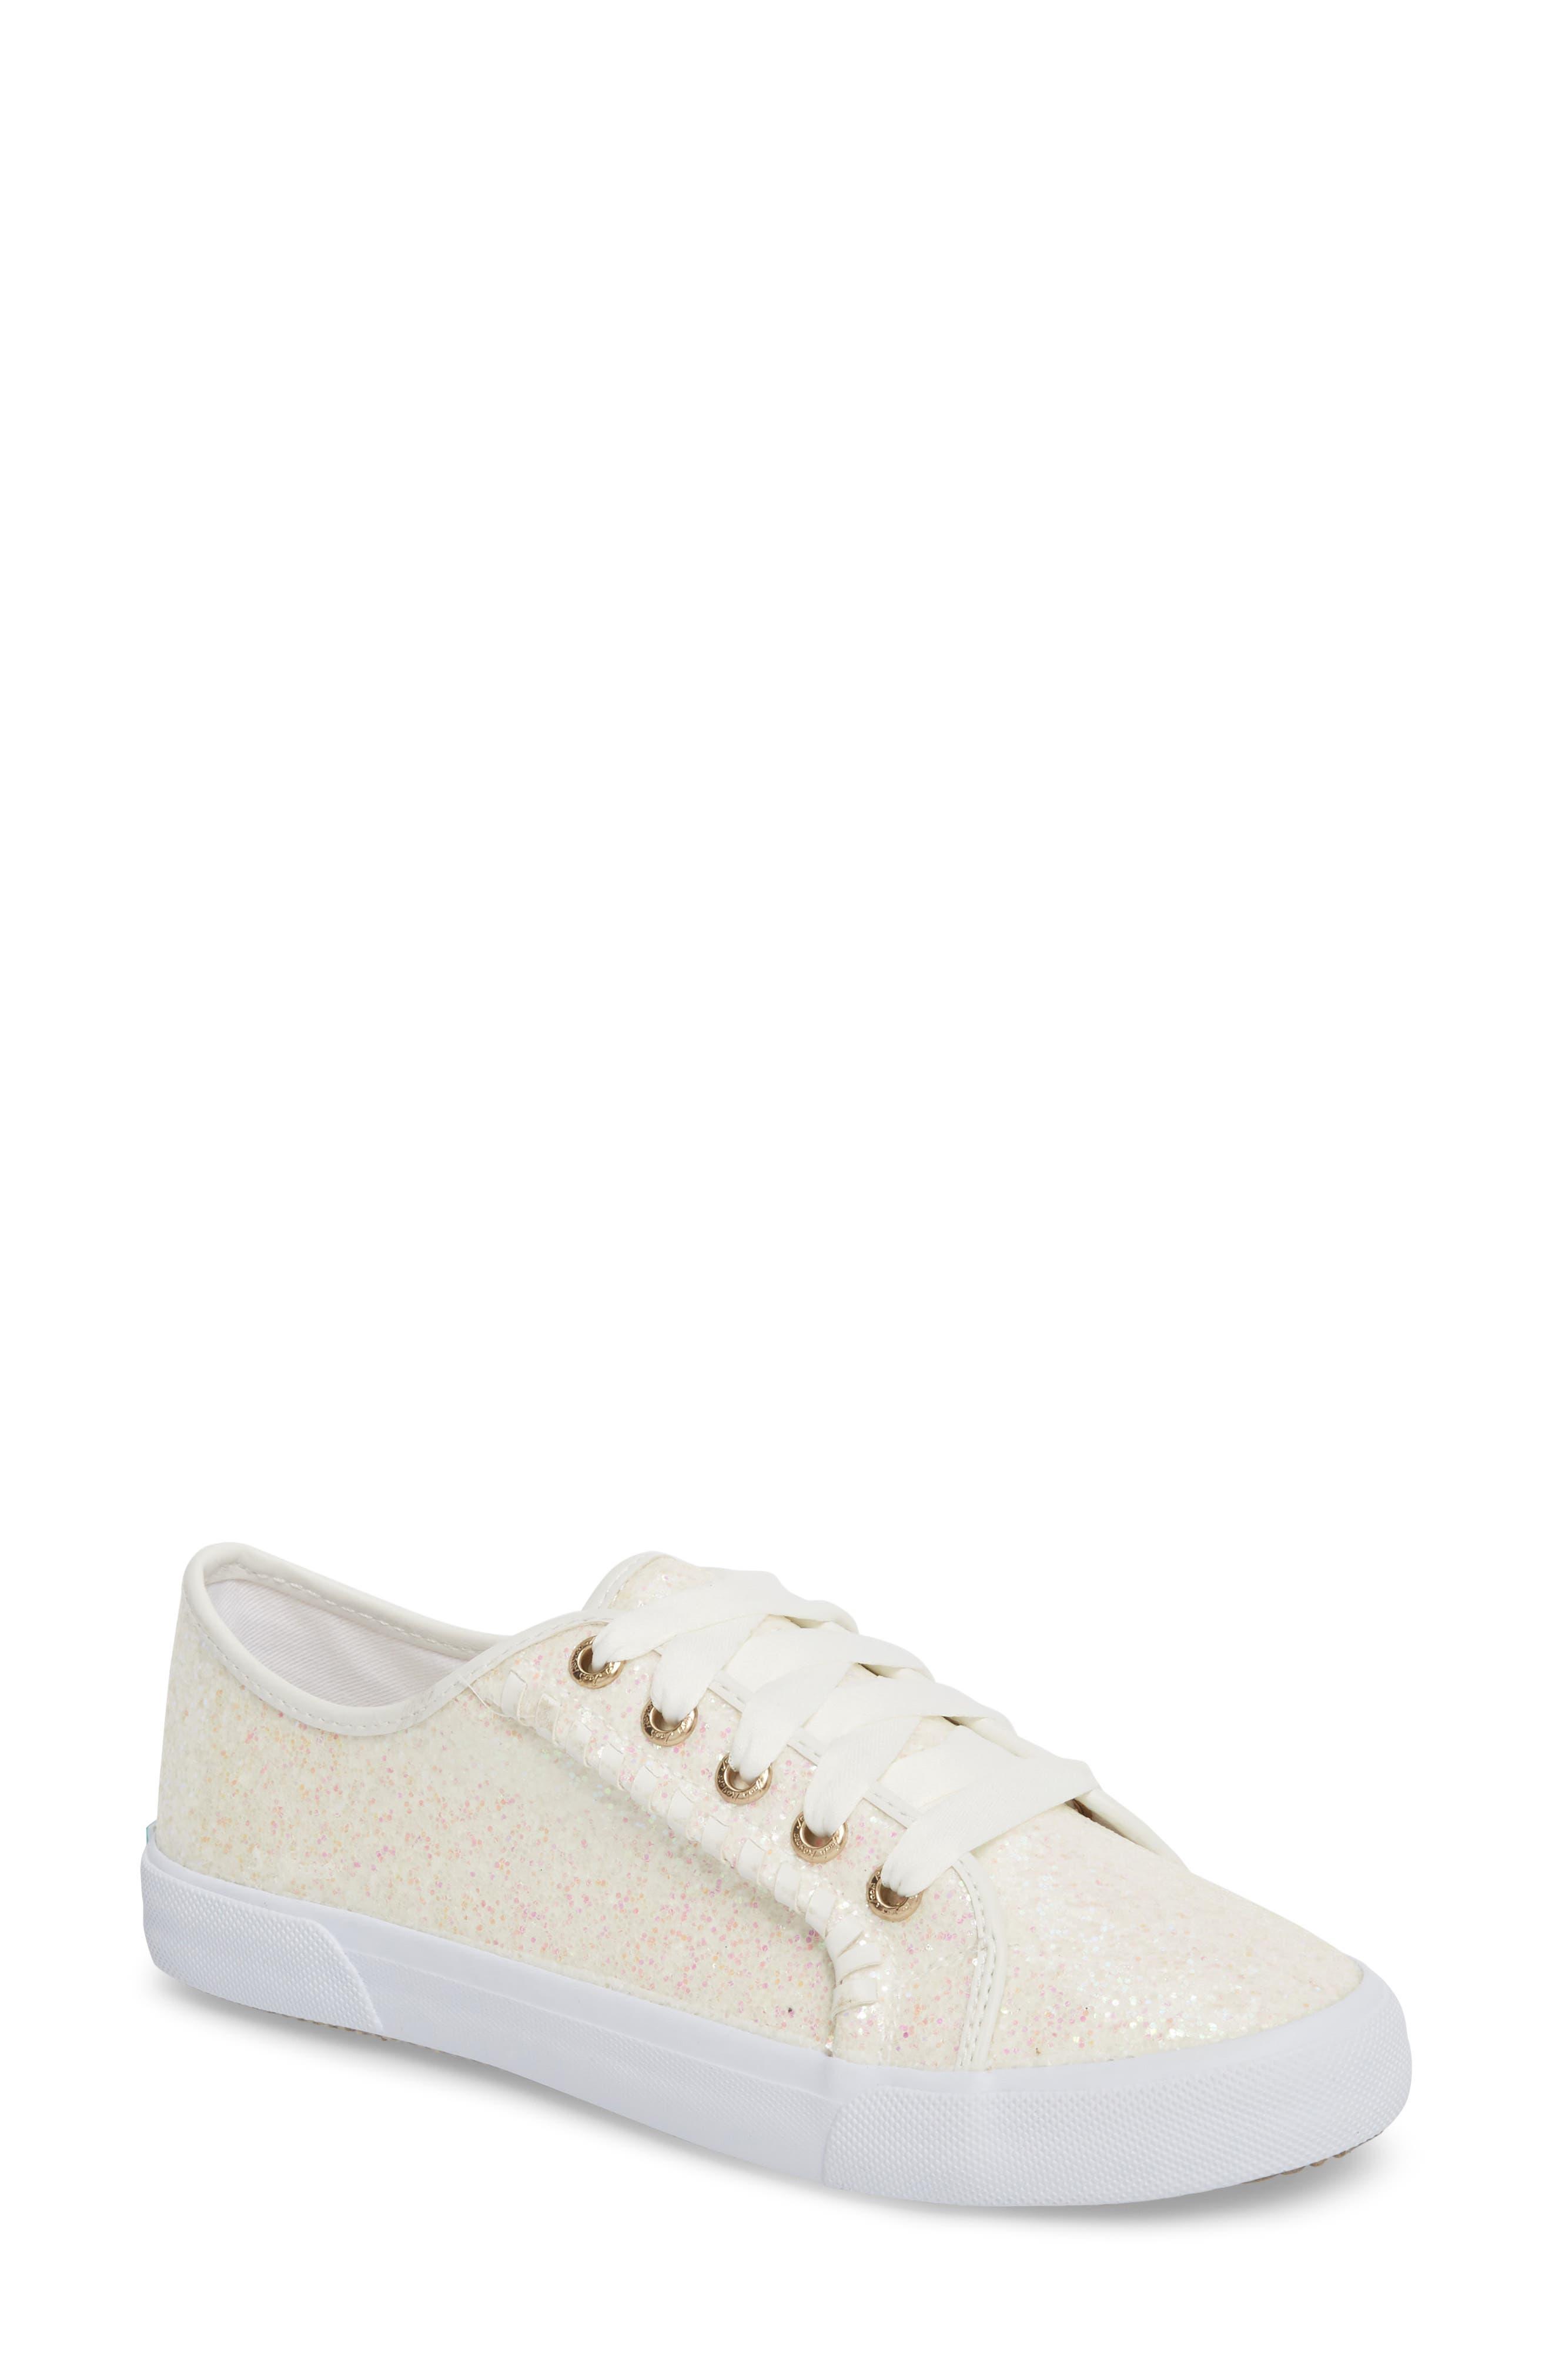 Carter Sneaker,                         Main,                         color, 116